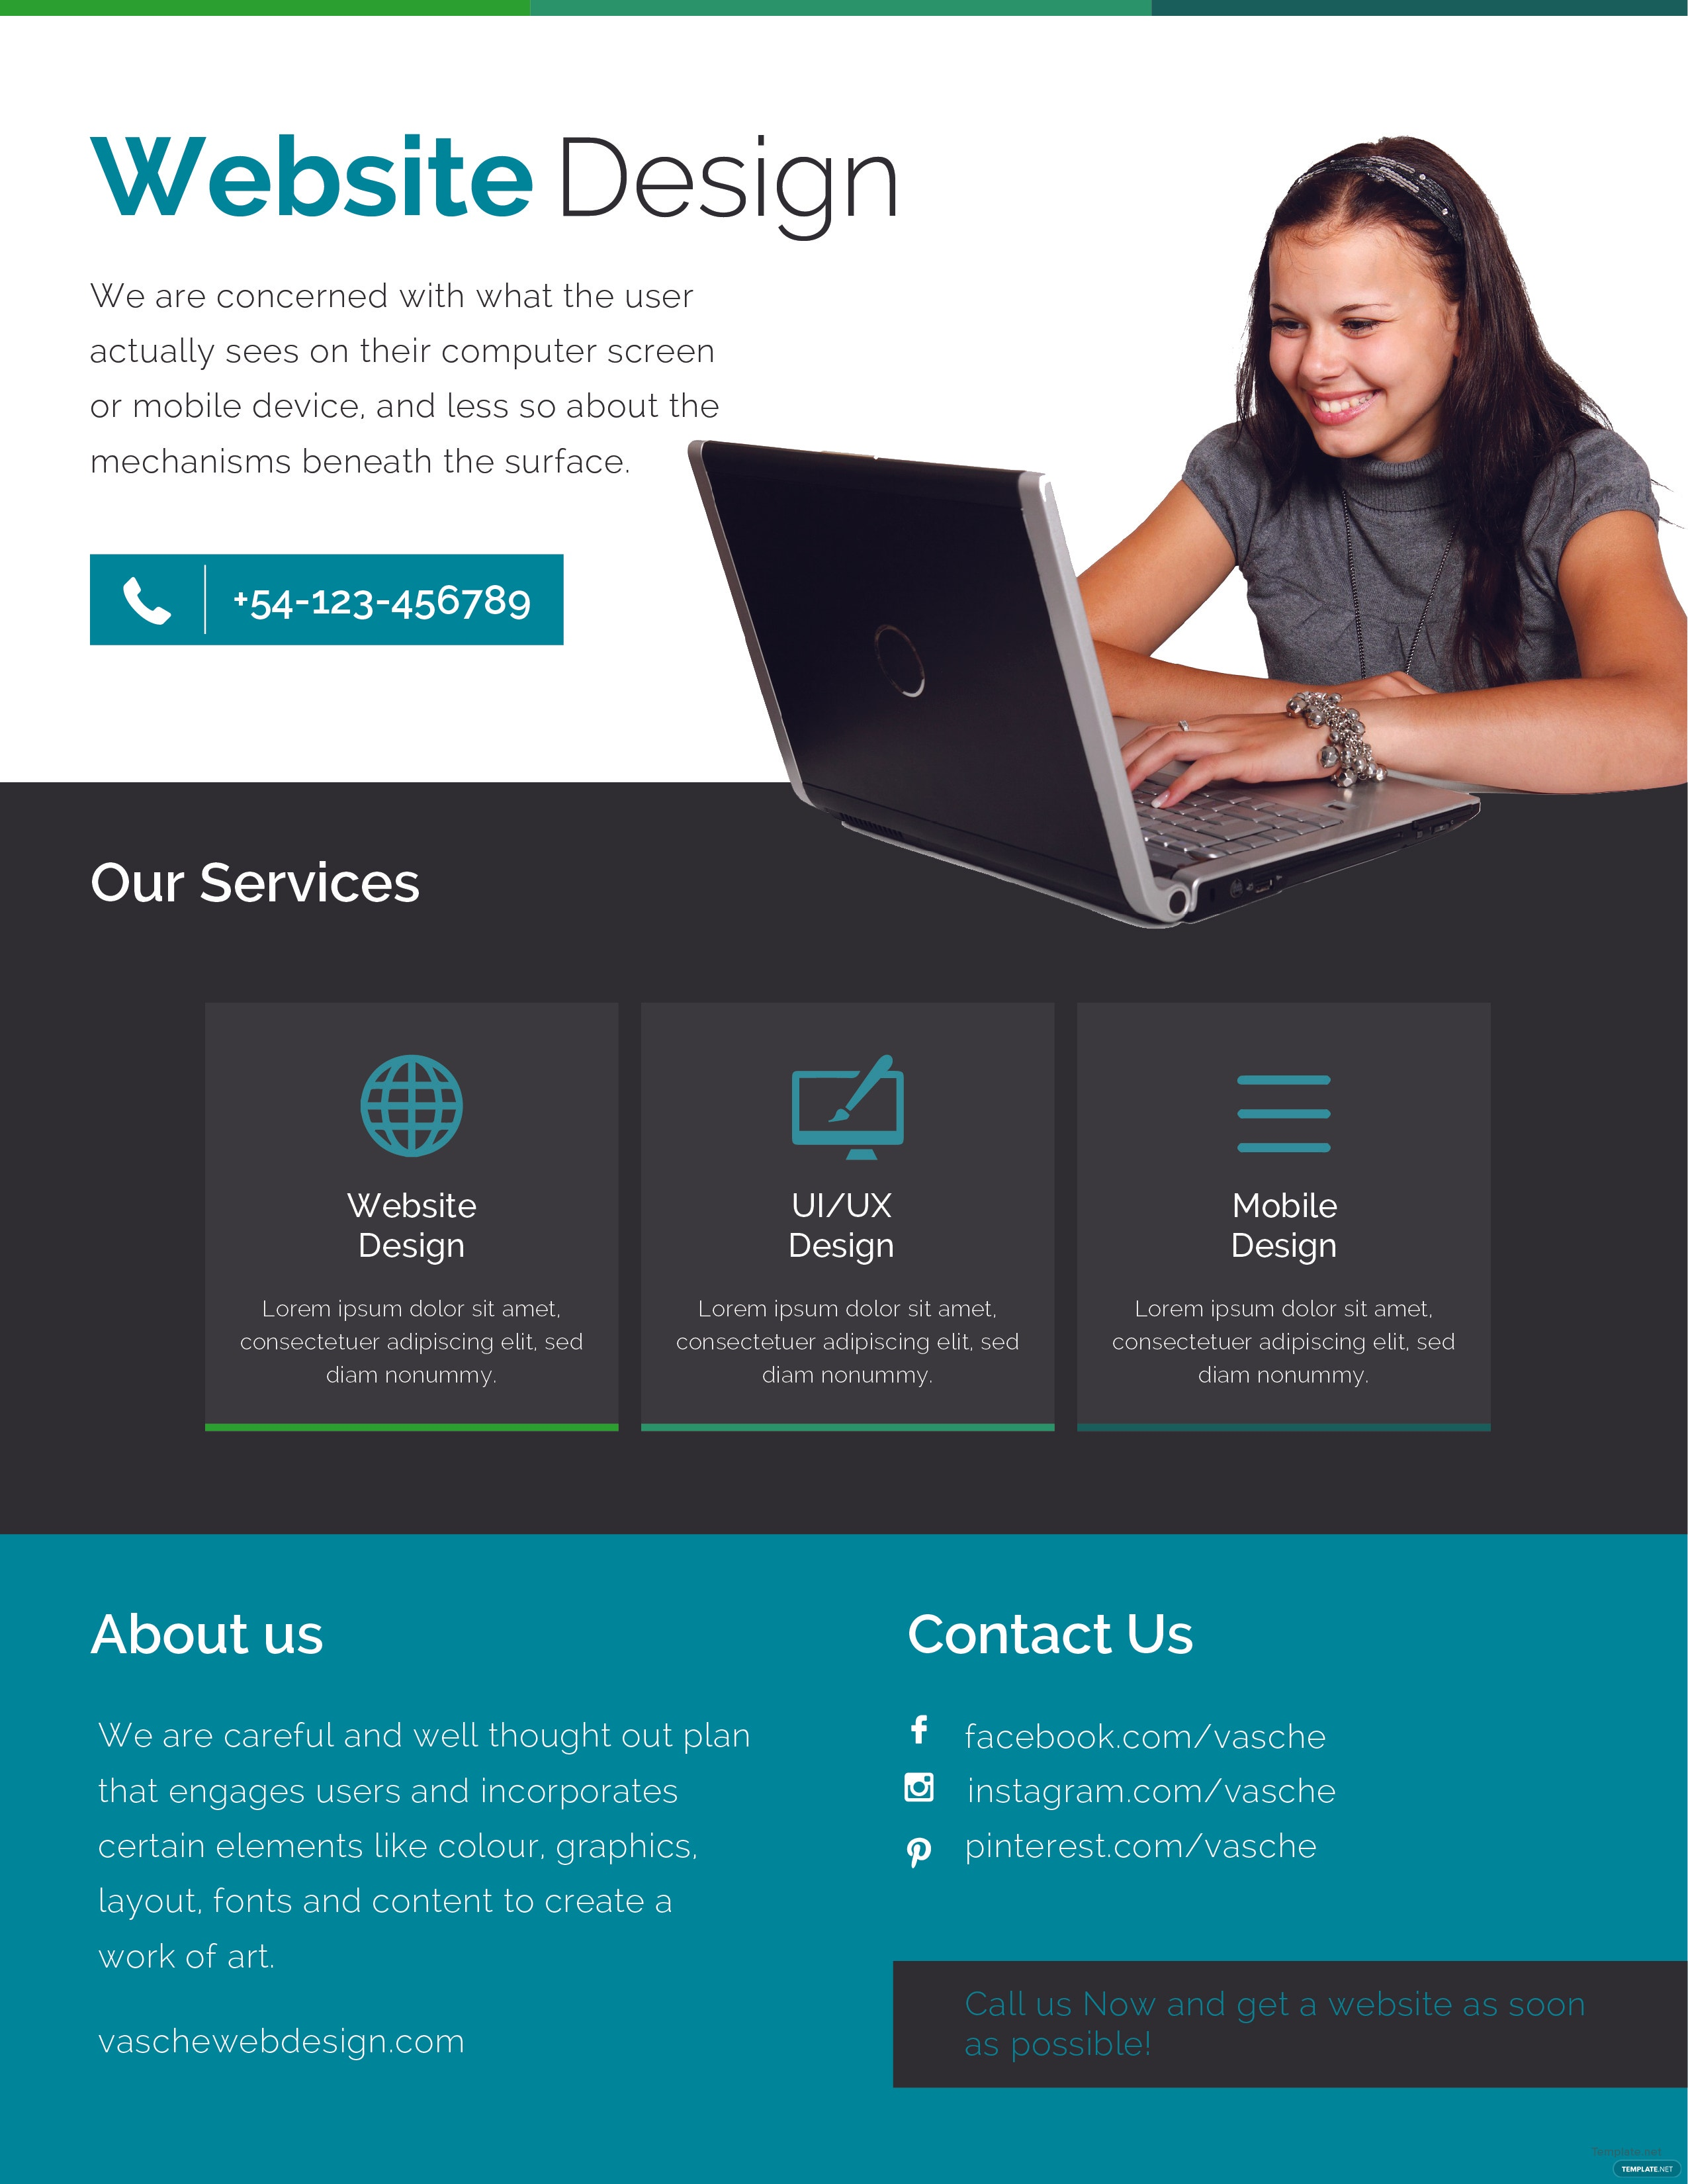 Free Website Design Flyer Template in Adobe Photoshop, Microsoft ...